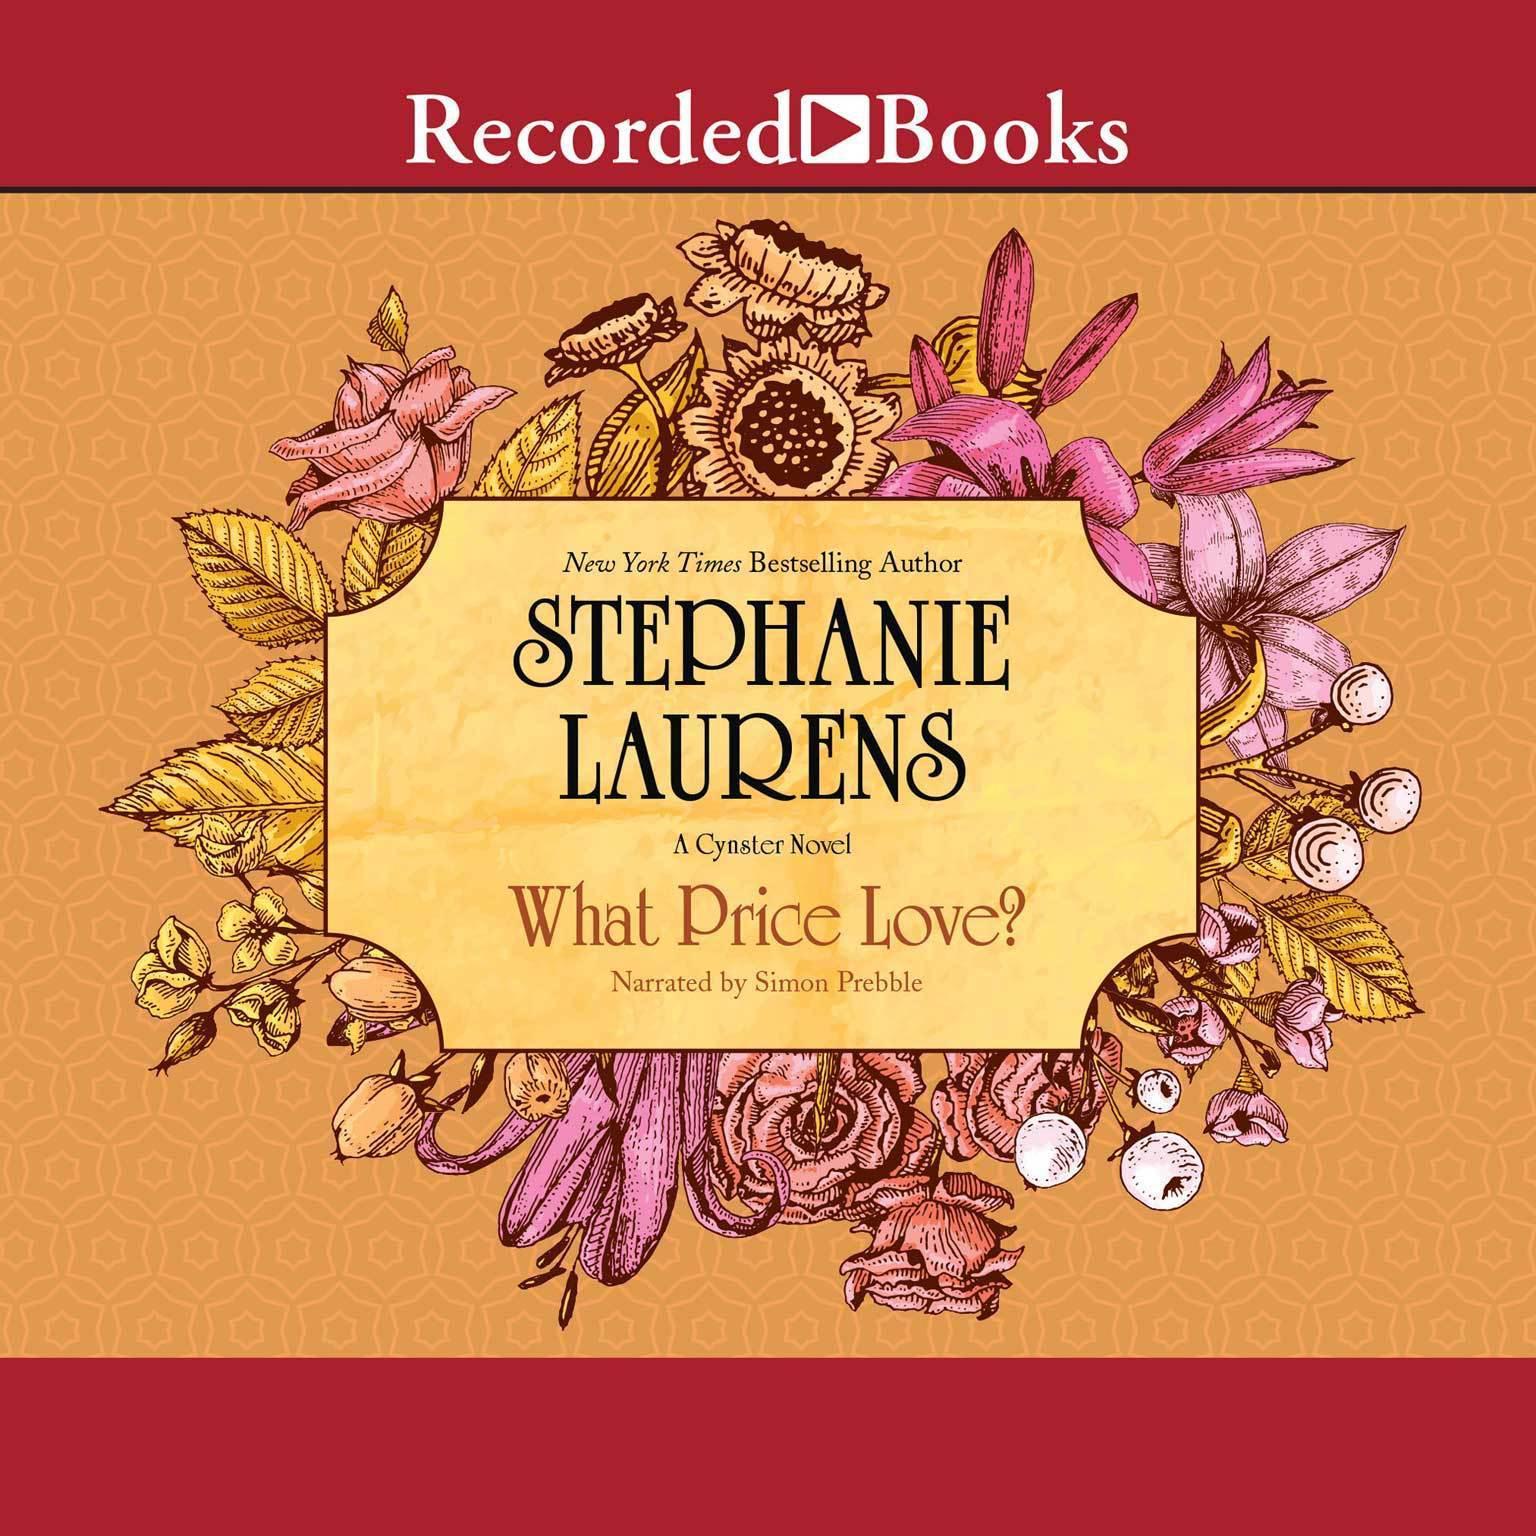 What Price Love? Audiobook, by Stephanie Laurens